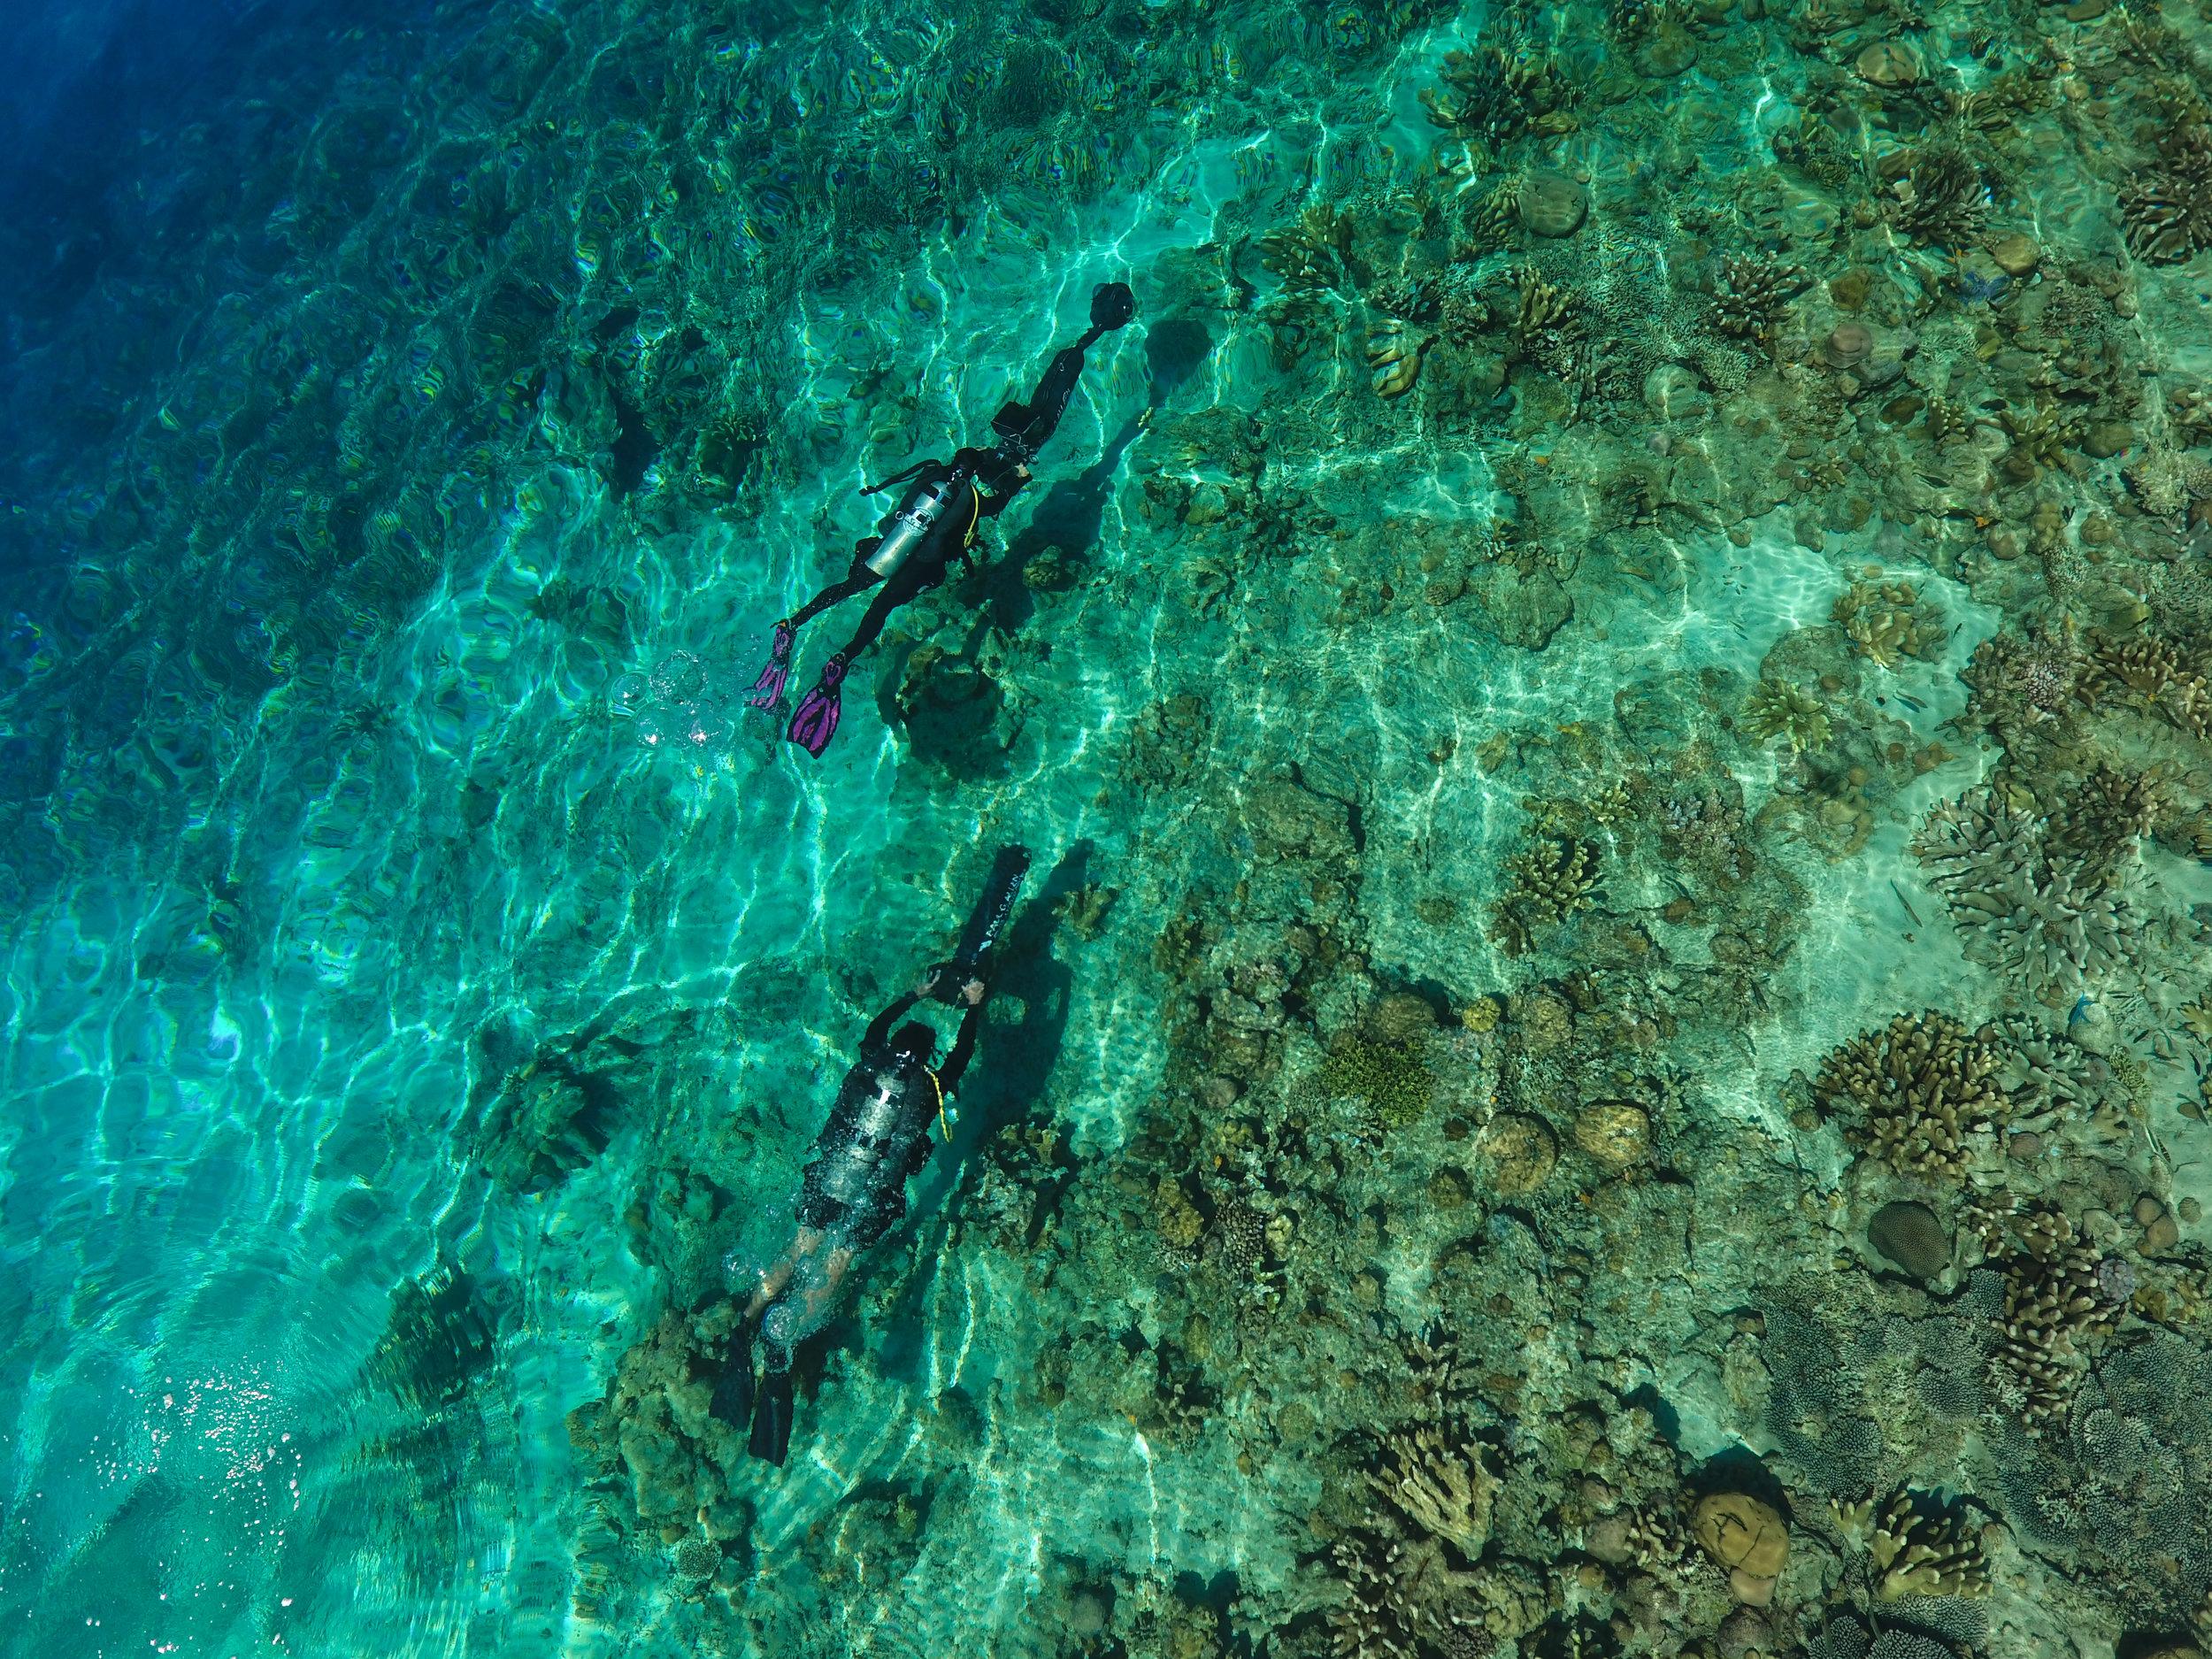 04 - scientific divers survey a coral reef CREDIT: The Ocean Agency / paul g. allen philanthropies